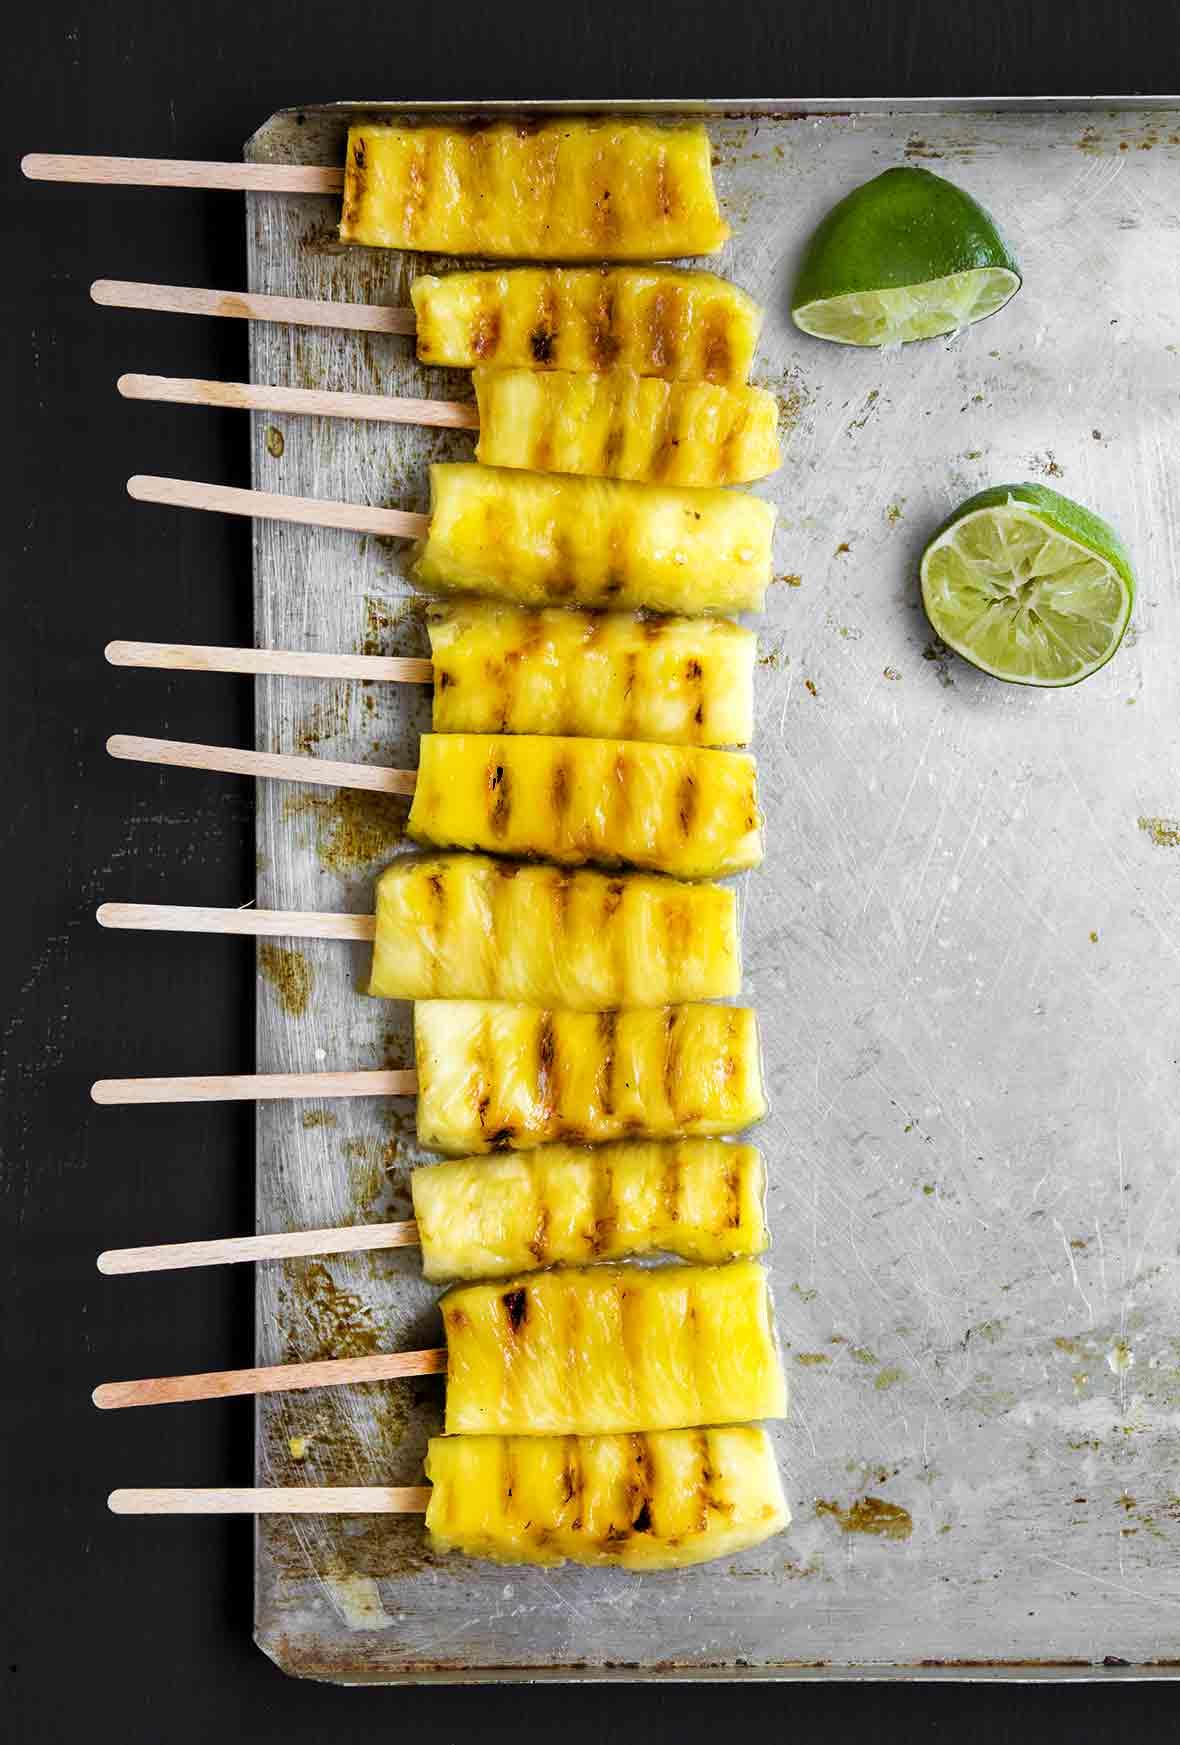 Ten grilled pineapple skewers on a metal baking sheet.